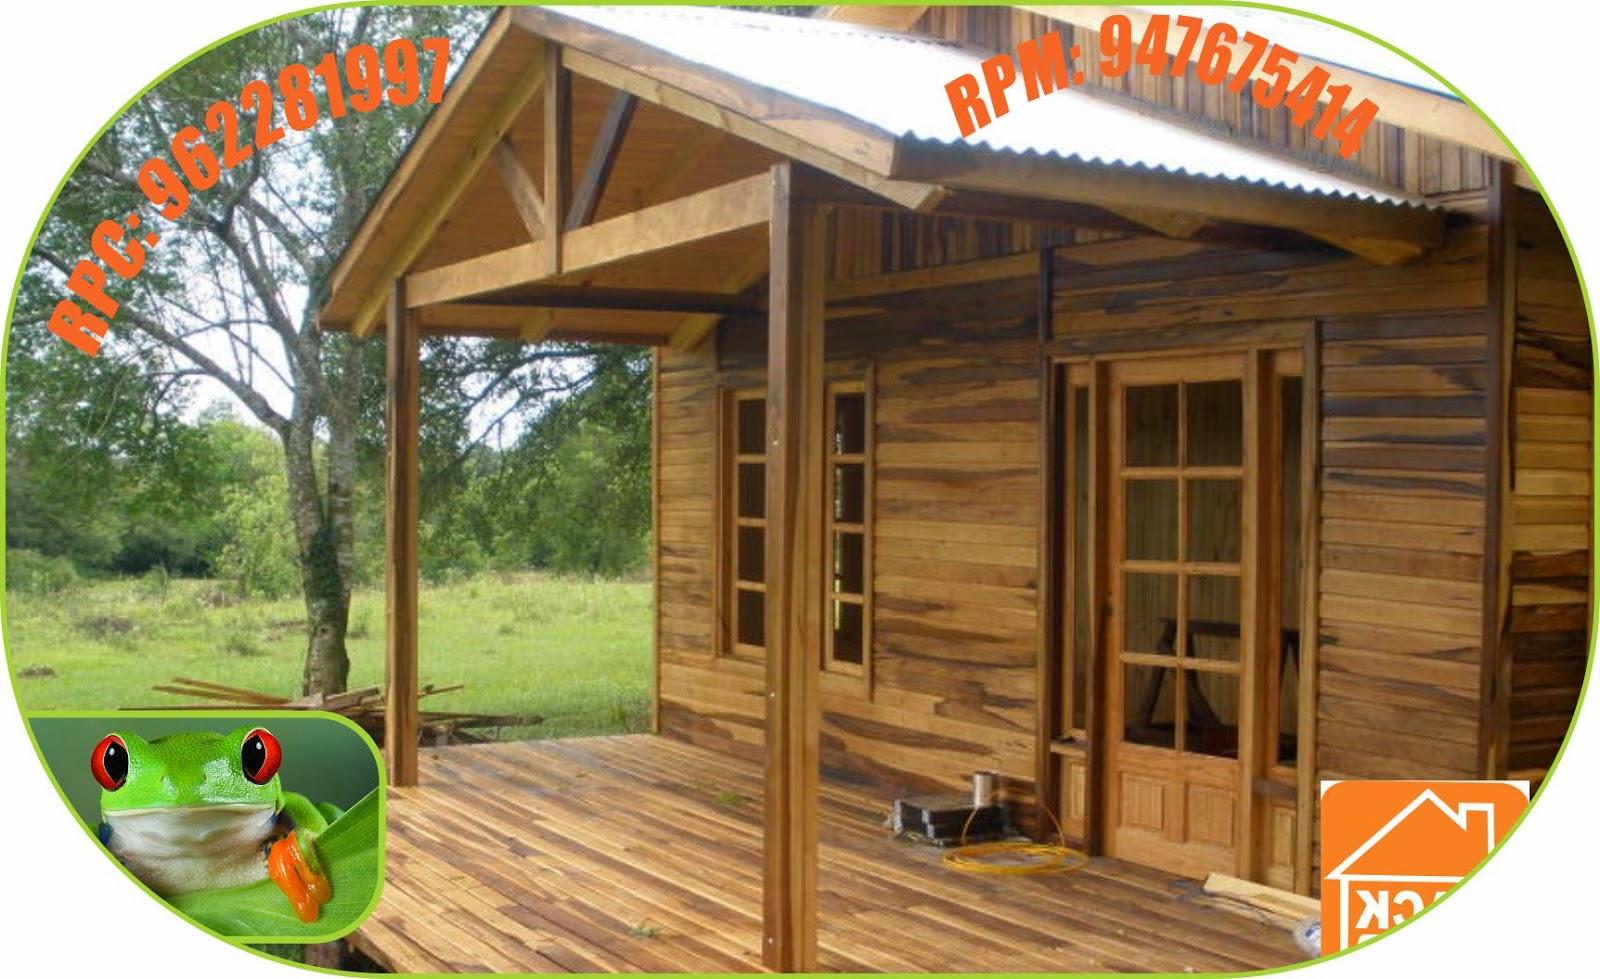 Bungalows caba as clubes esparcimiento campestre en lima for Cabana madera precio